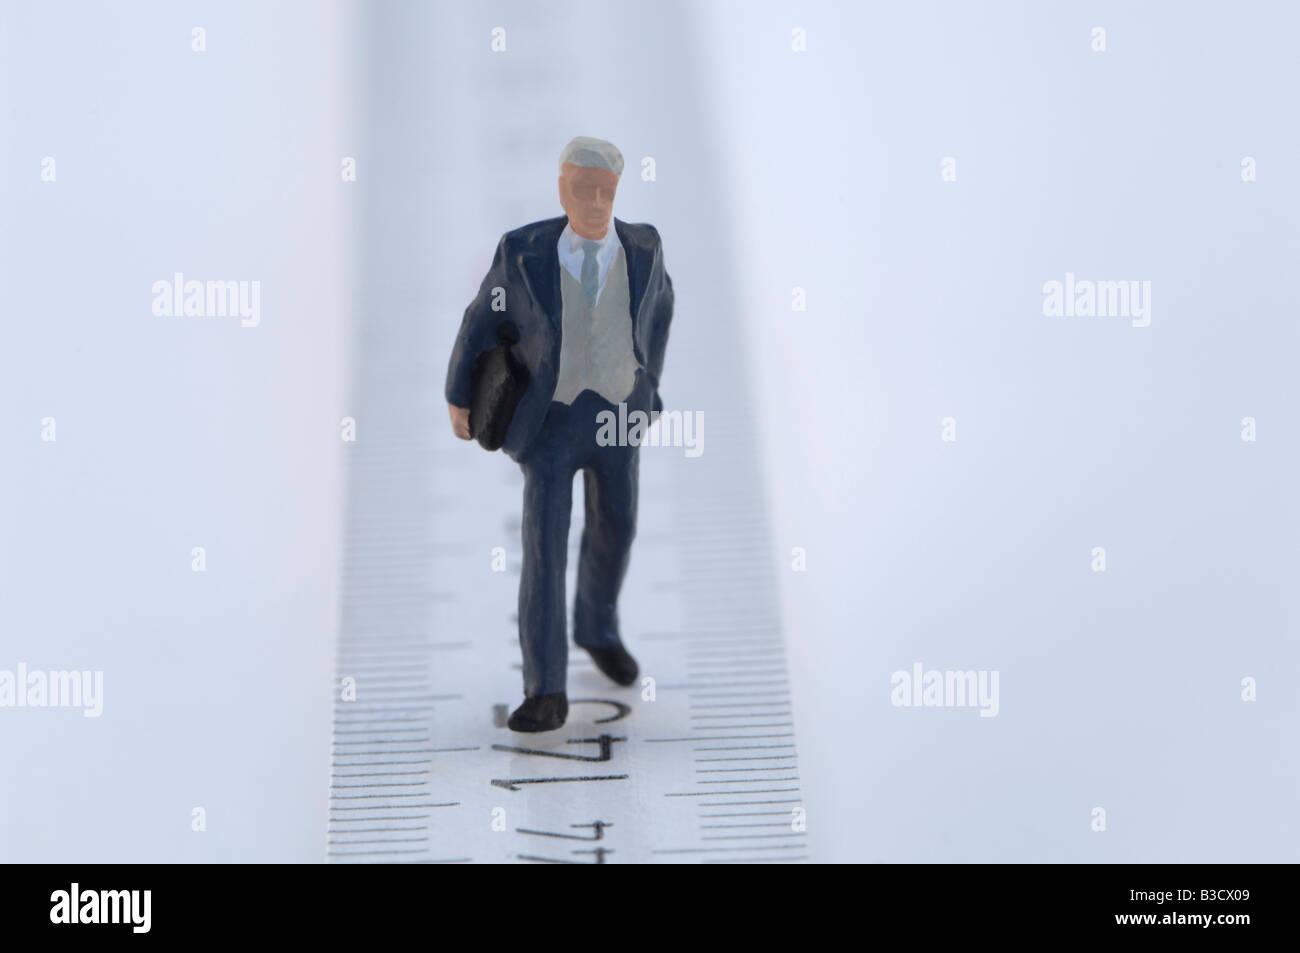 Business man figurine on measuring tape - Stock Image